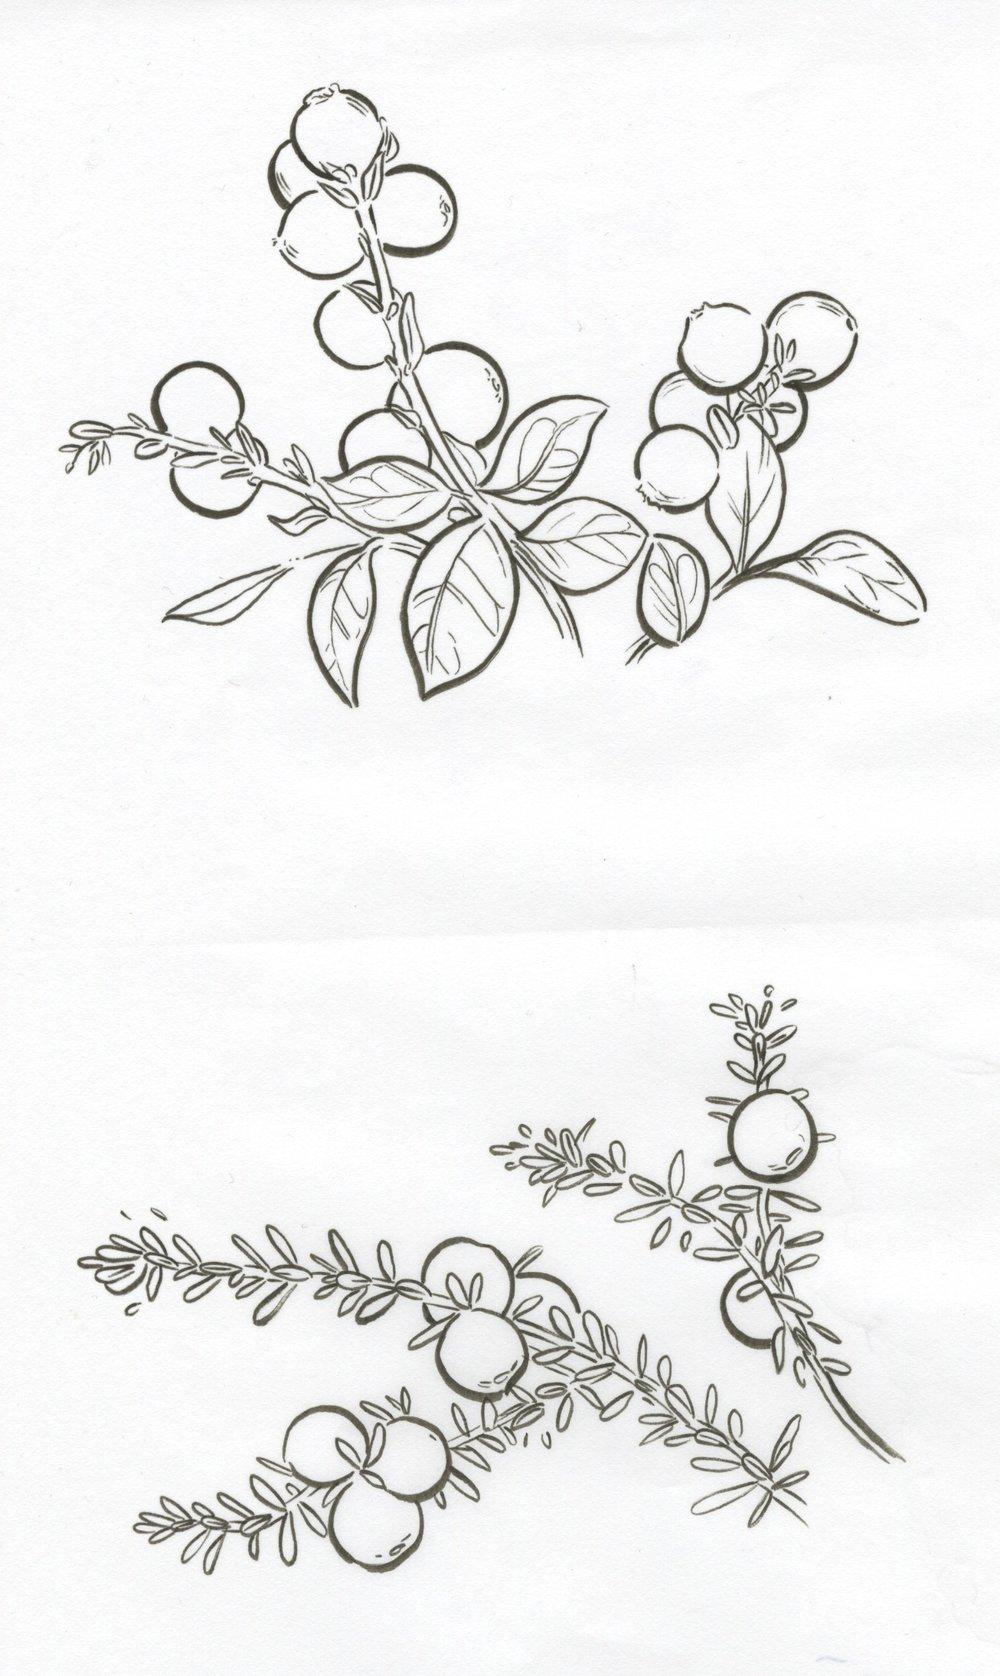 crowberries and cranberries.jpeg